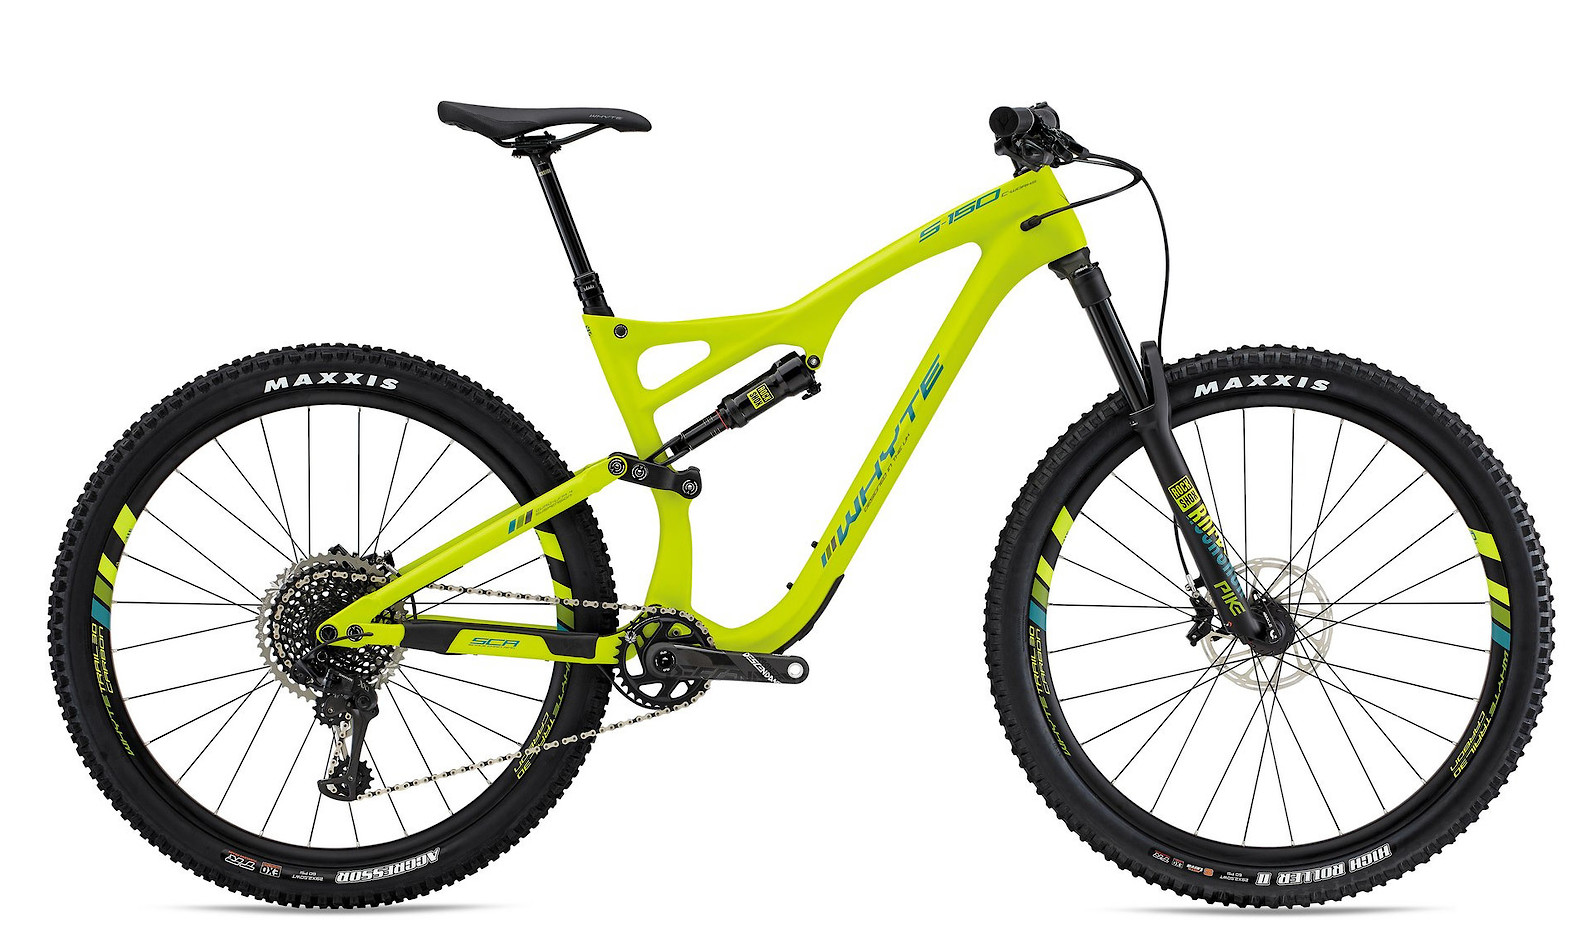 2019 Whyte S-150C Works Bike